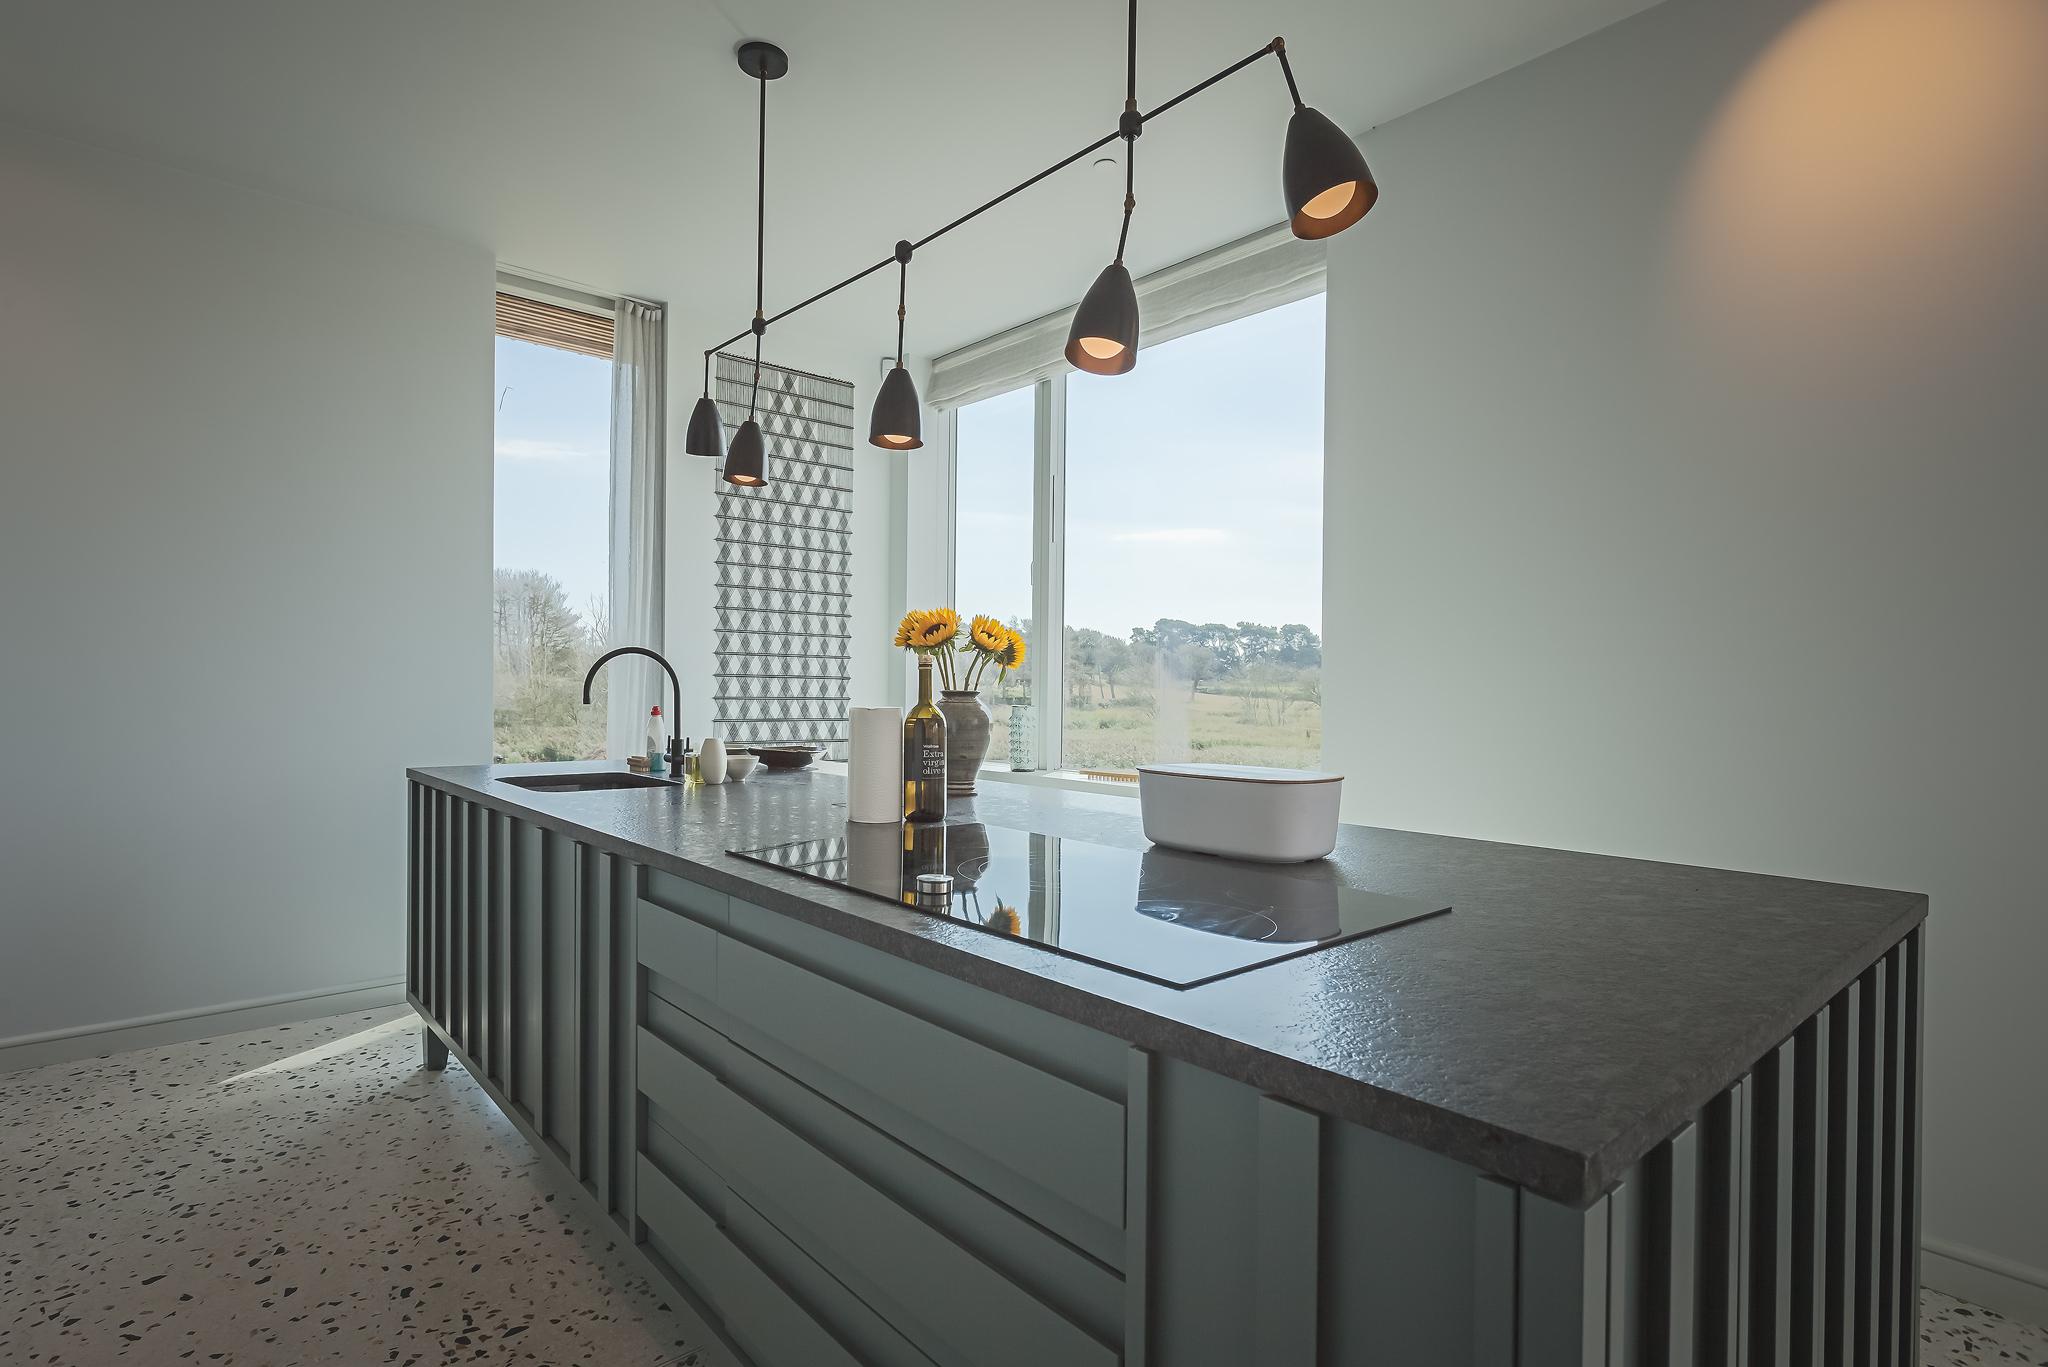 Hand Painted Kitchen - Jason @ JS Decor